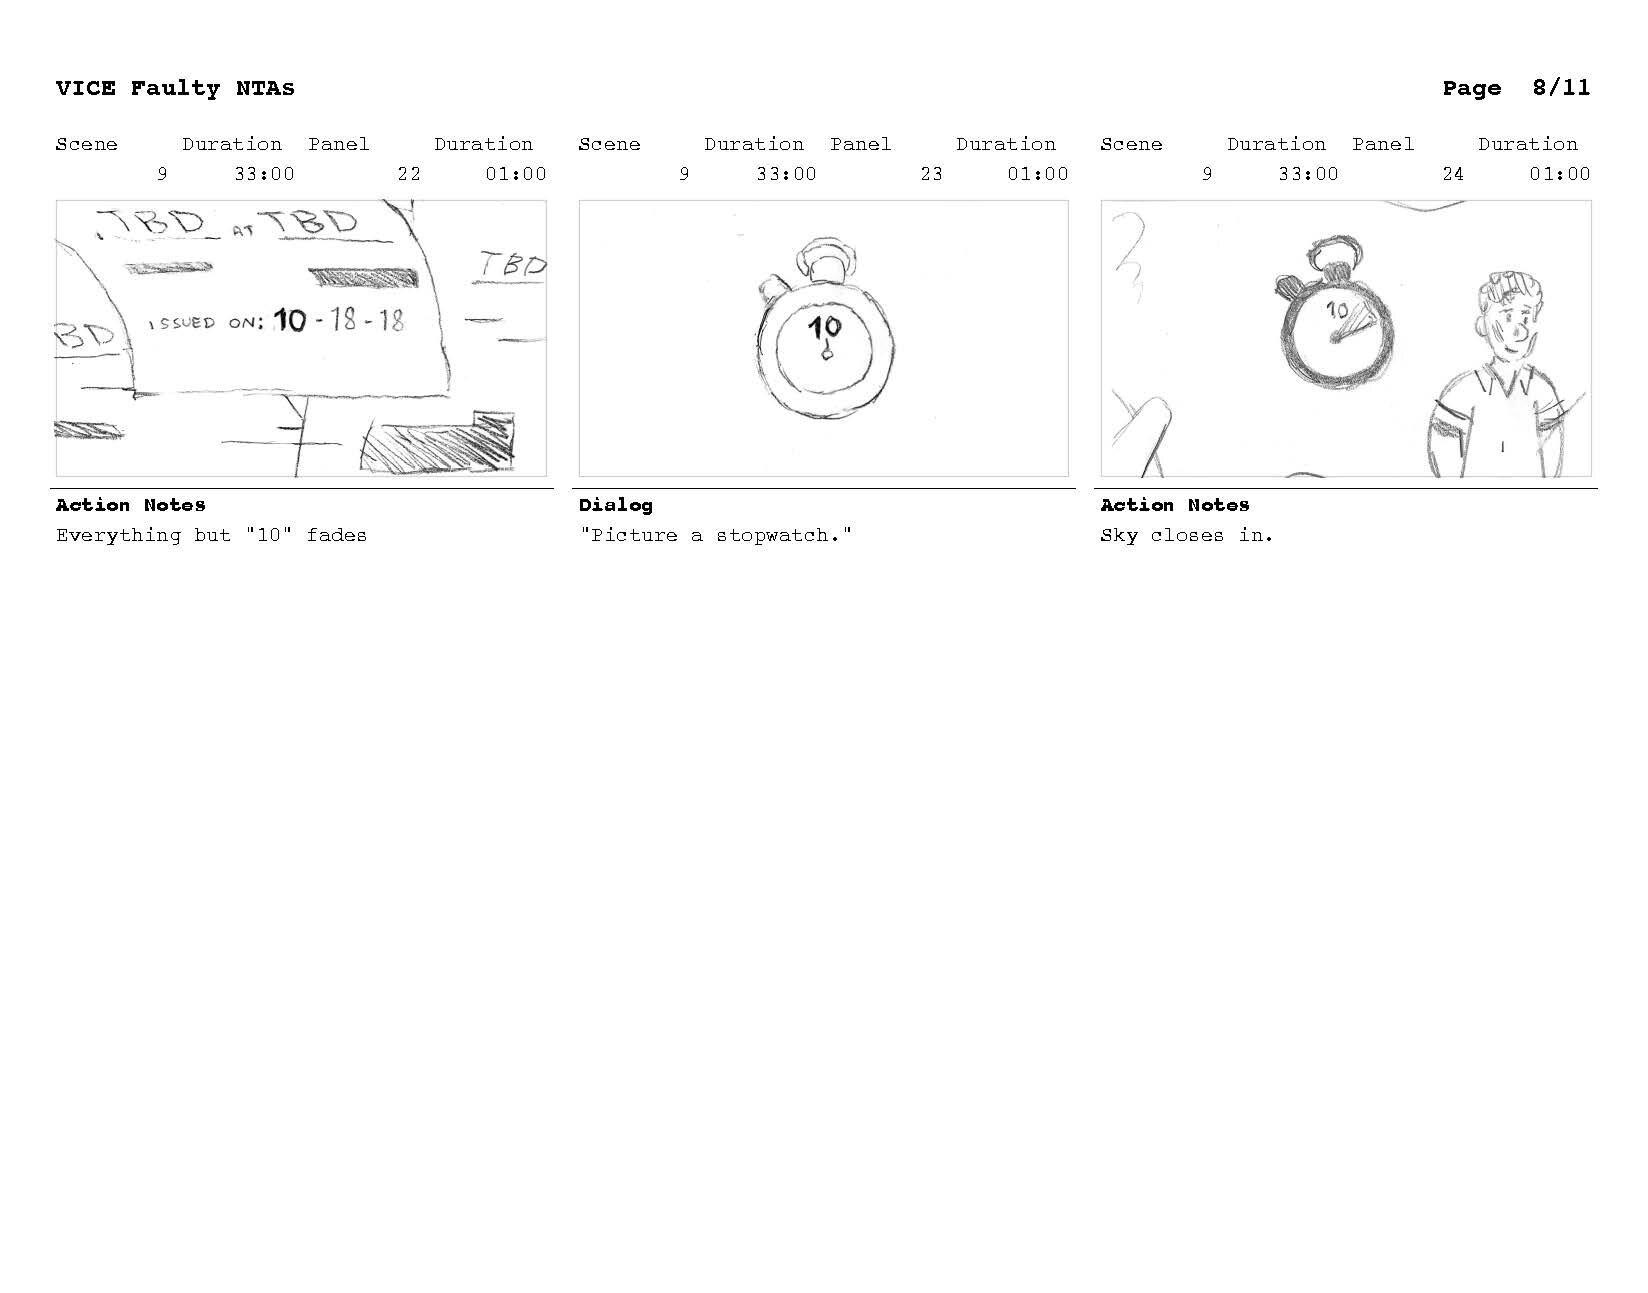 VICE News Tonight - Faulty NTAs storyboard_Page_08.jpg